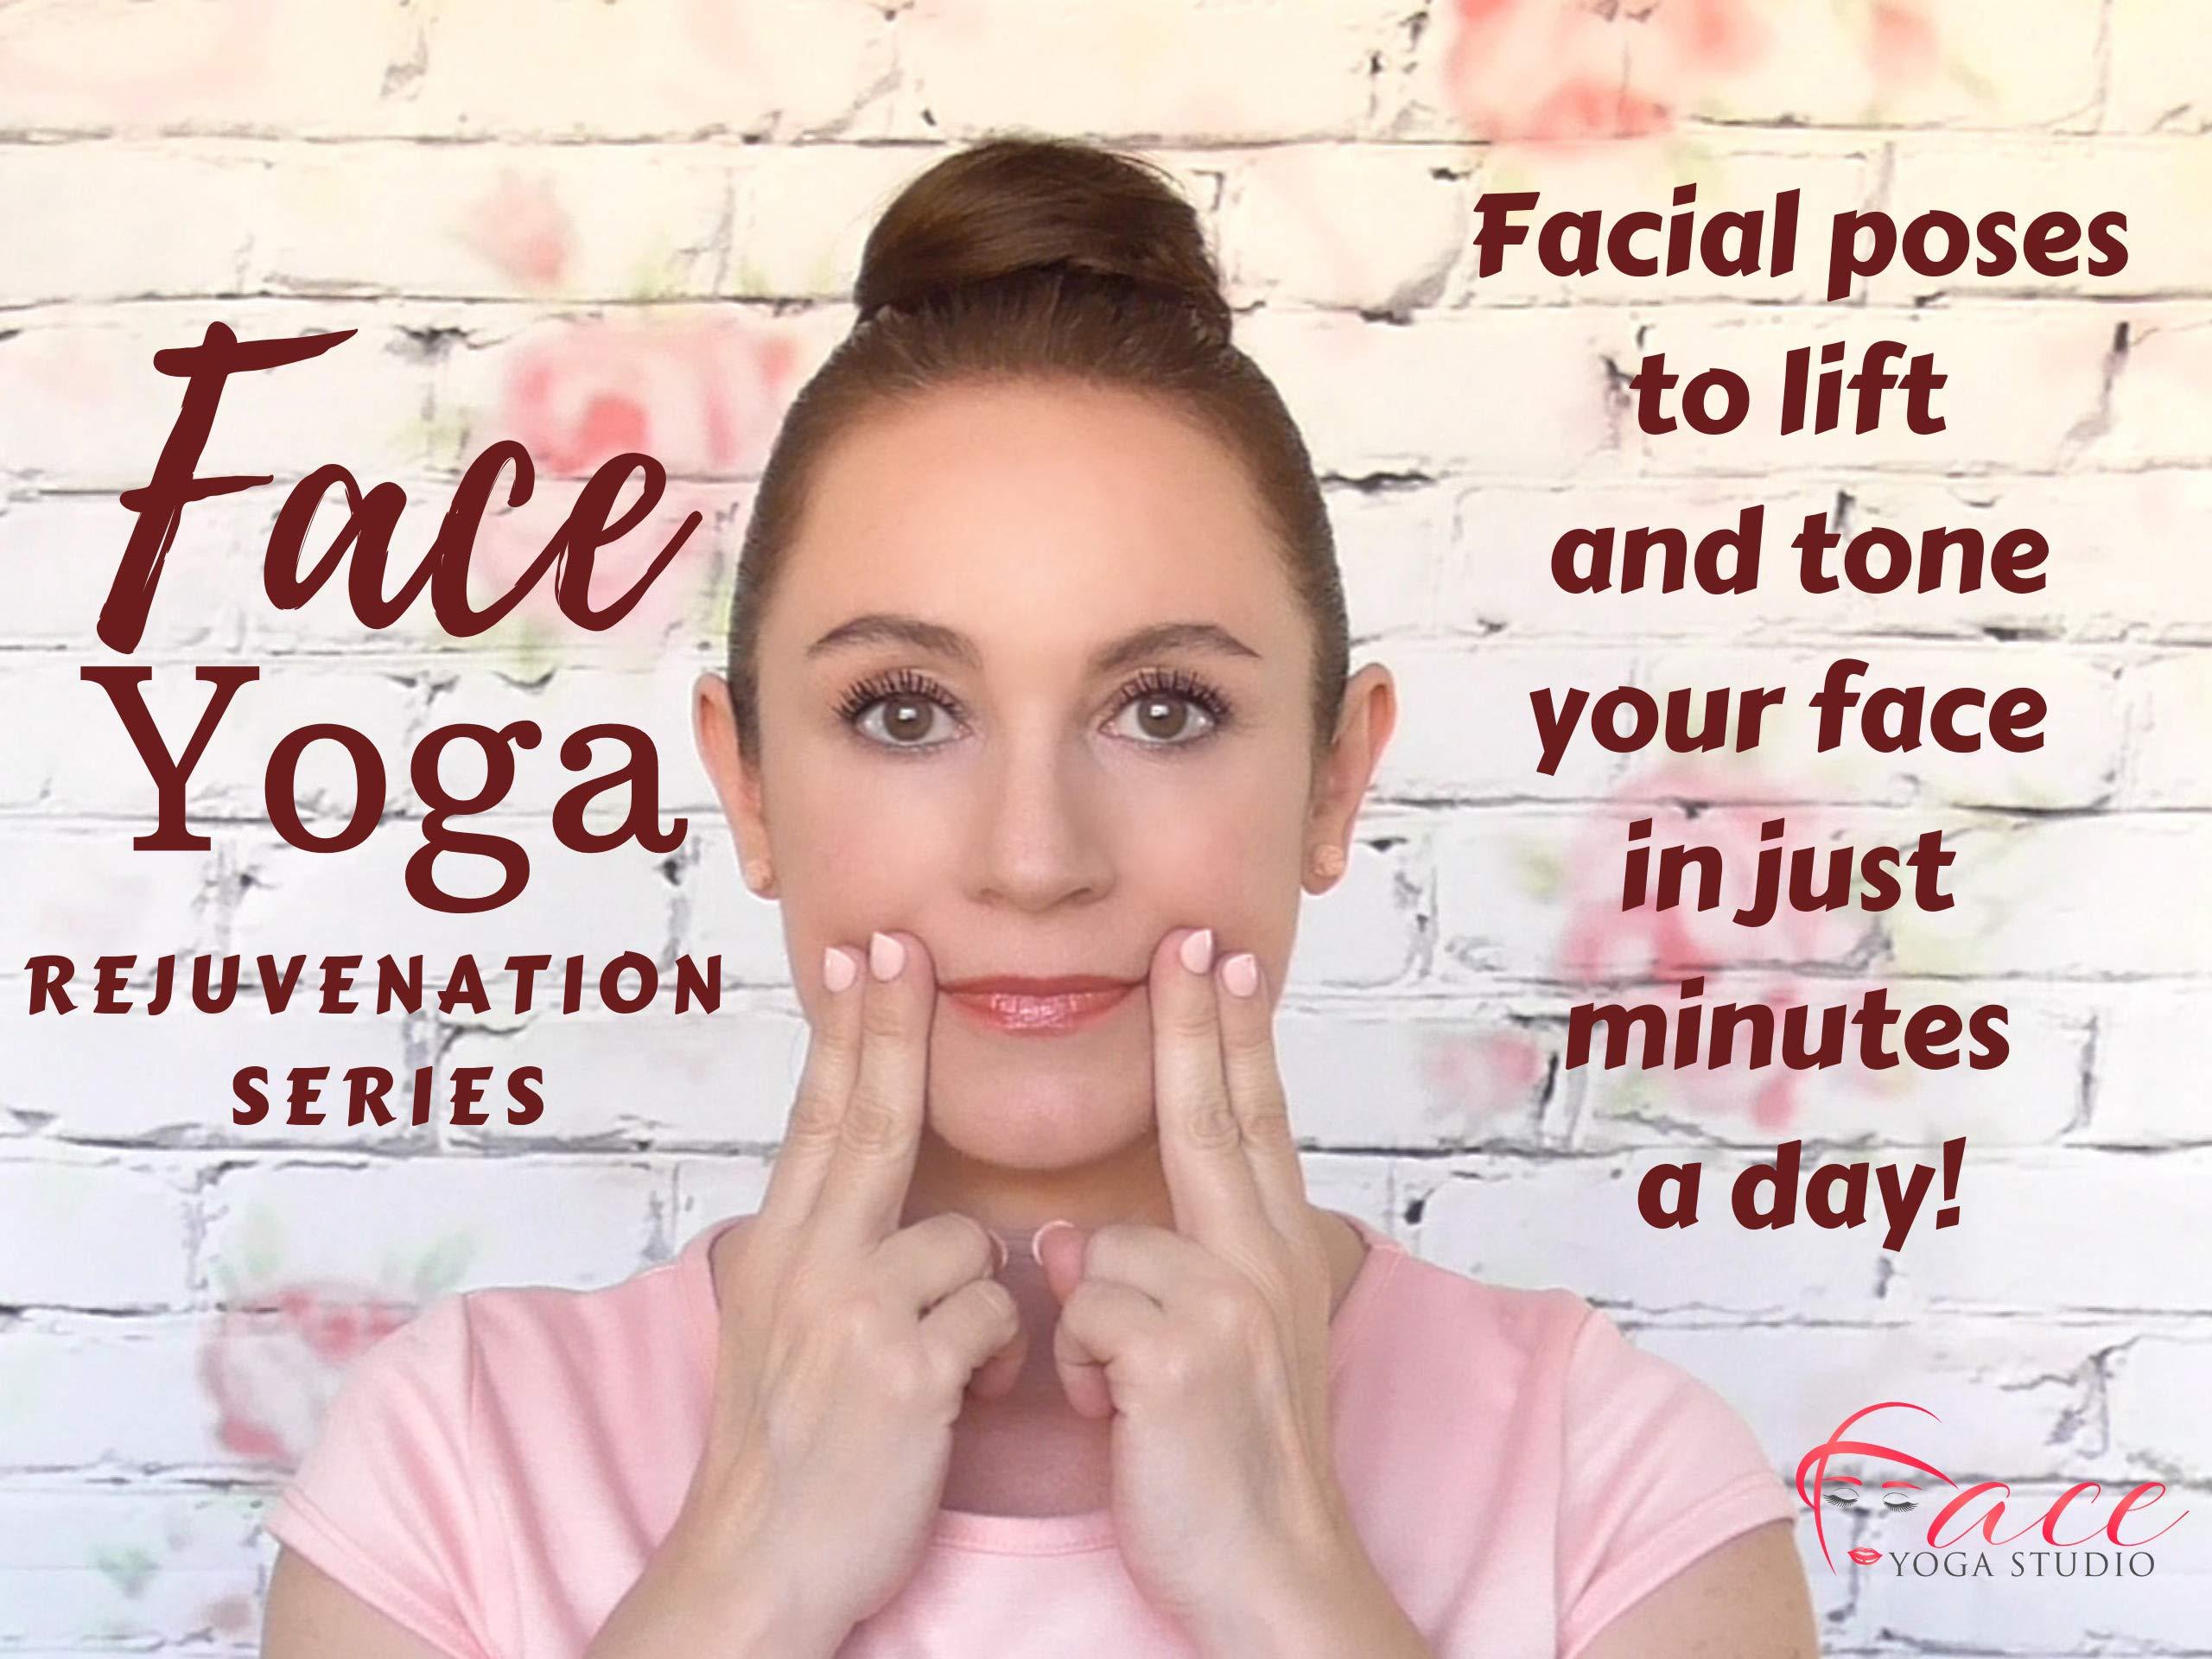 Watch Face Yoga Rejuvenation Series | Prime Video